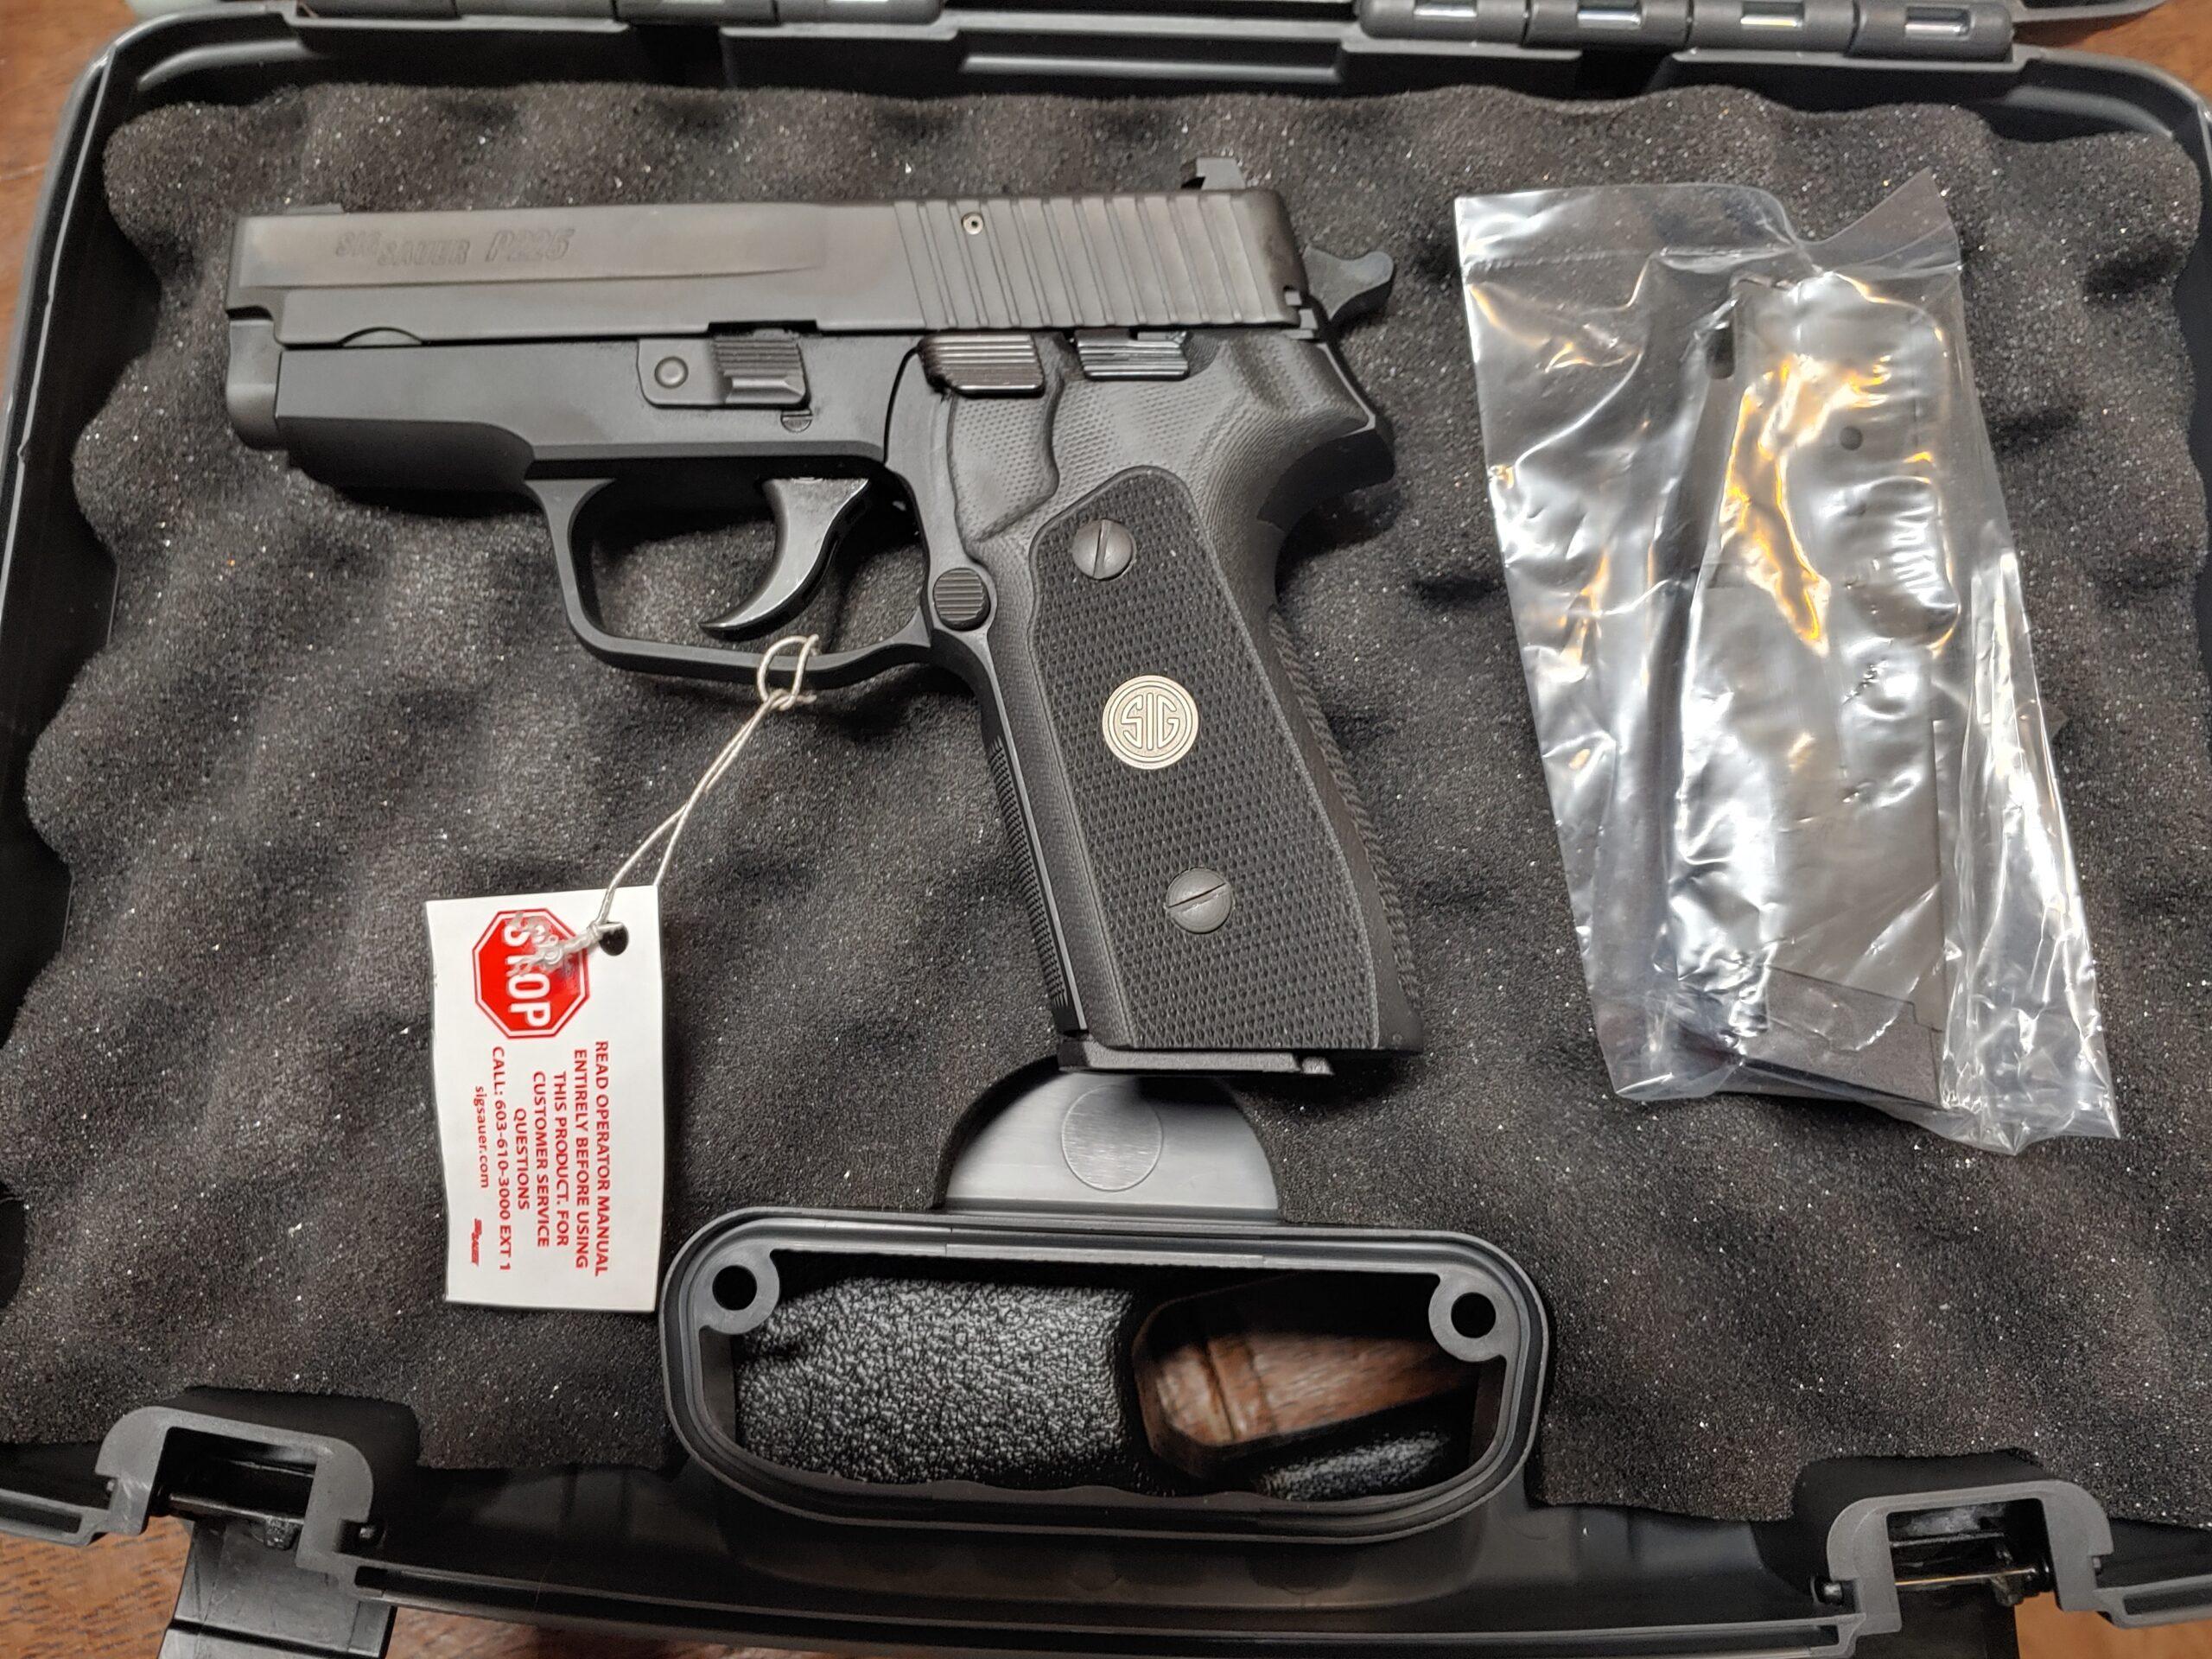 Sig Sauer P225 9mm